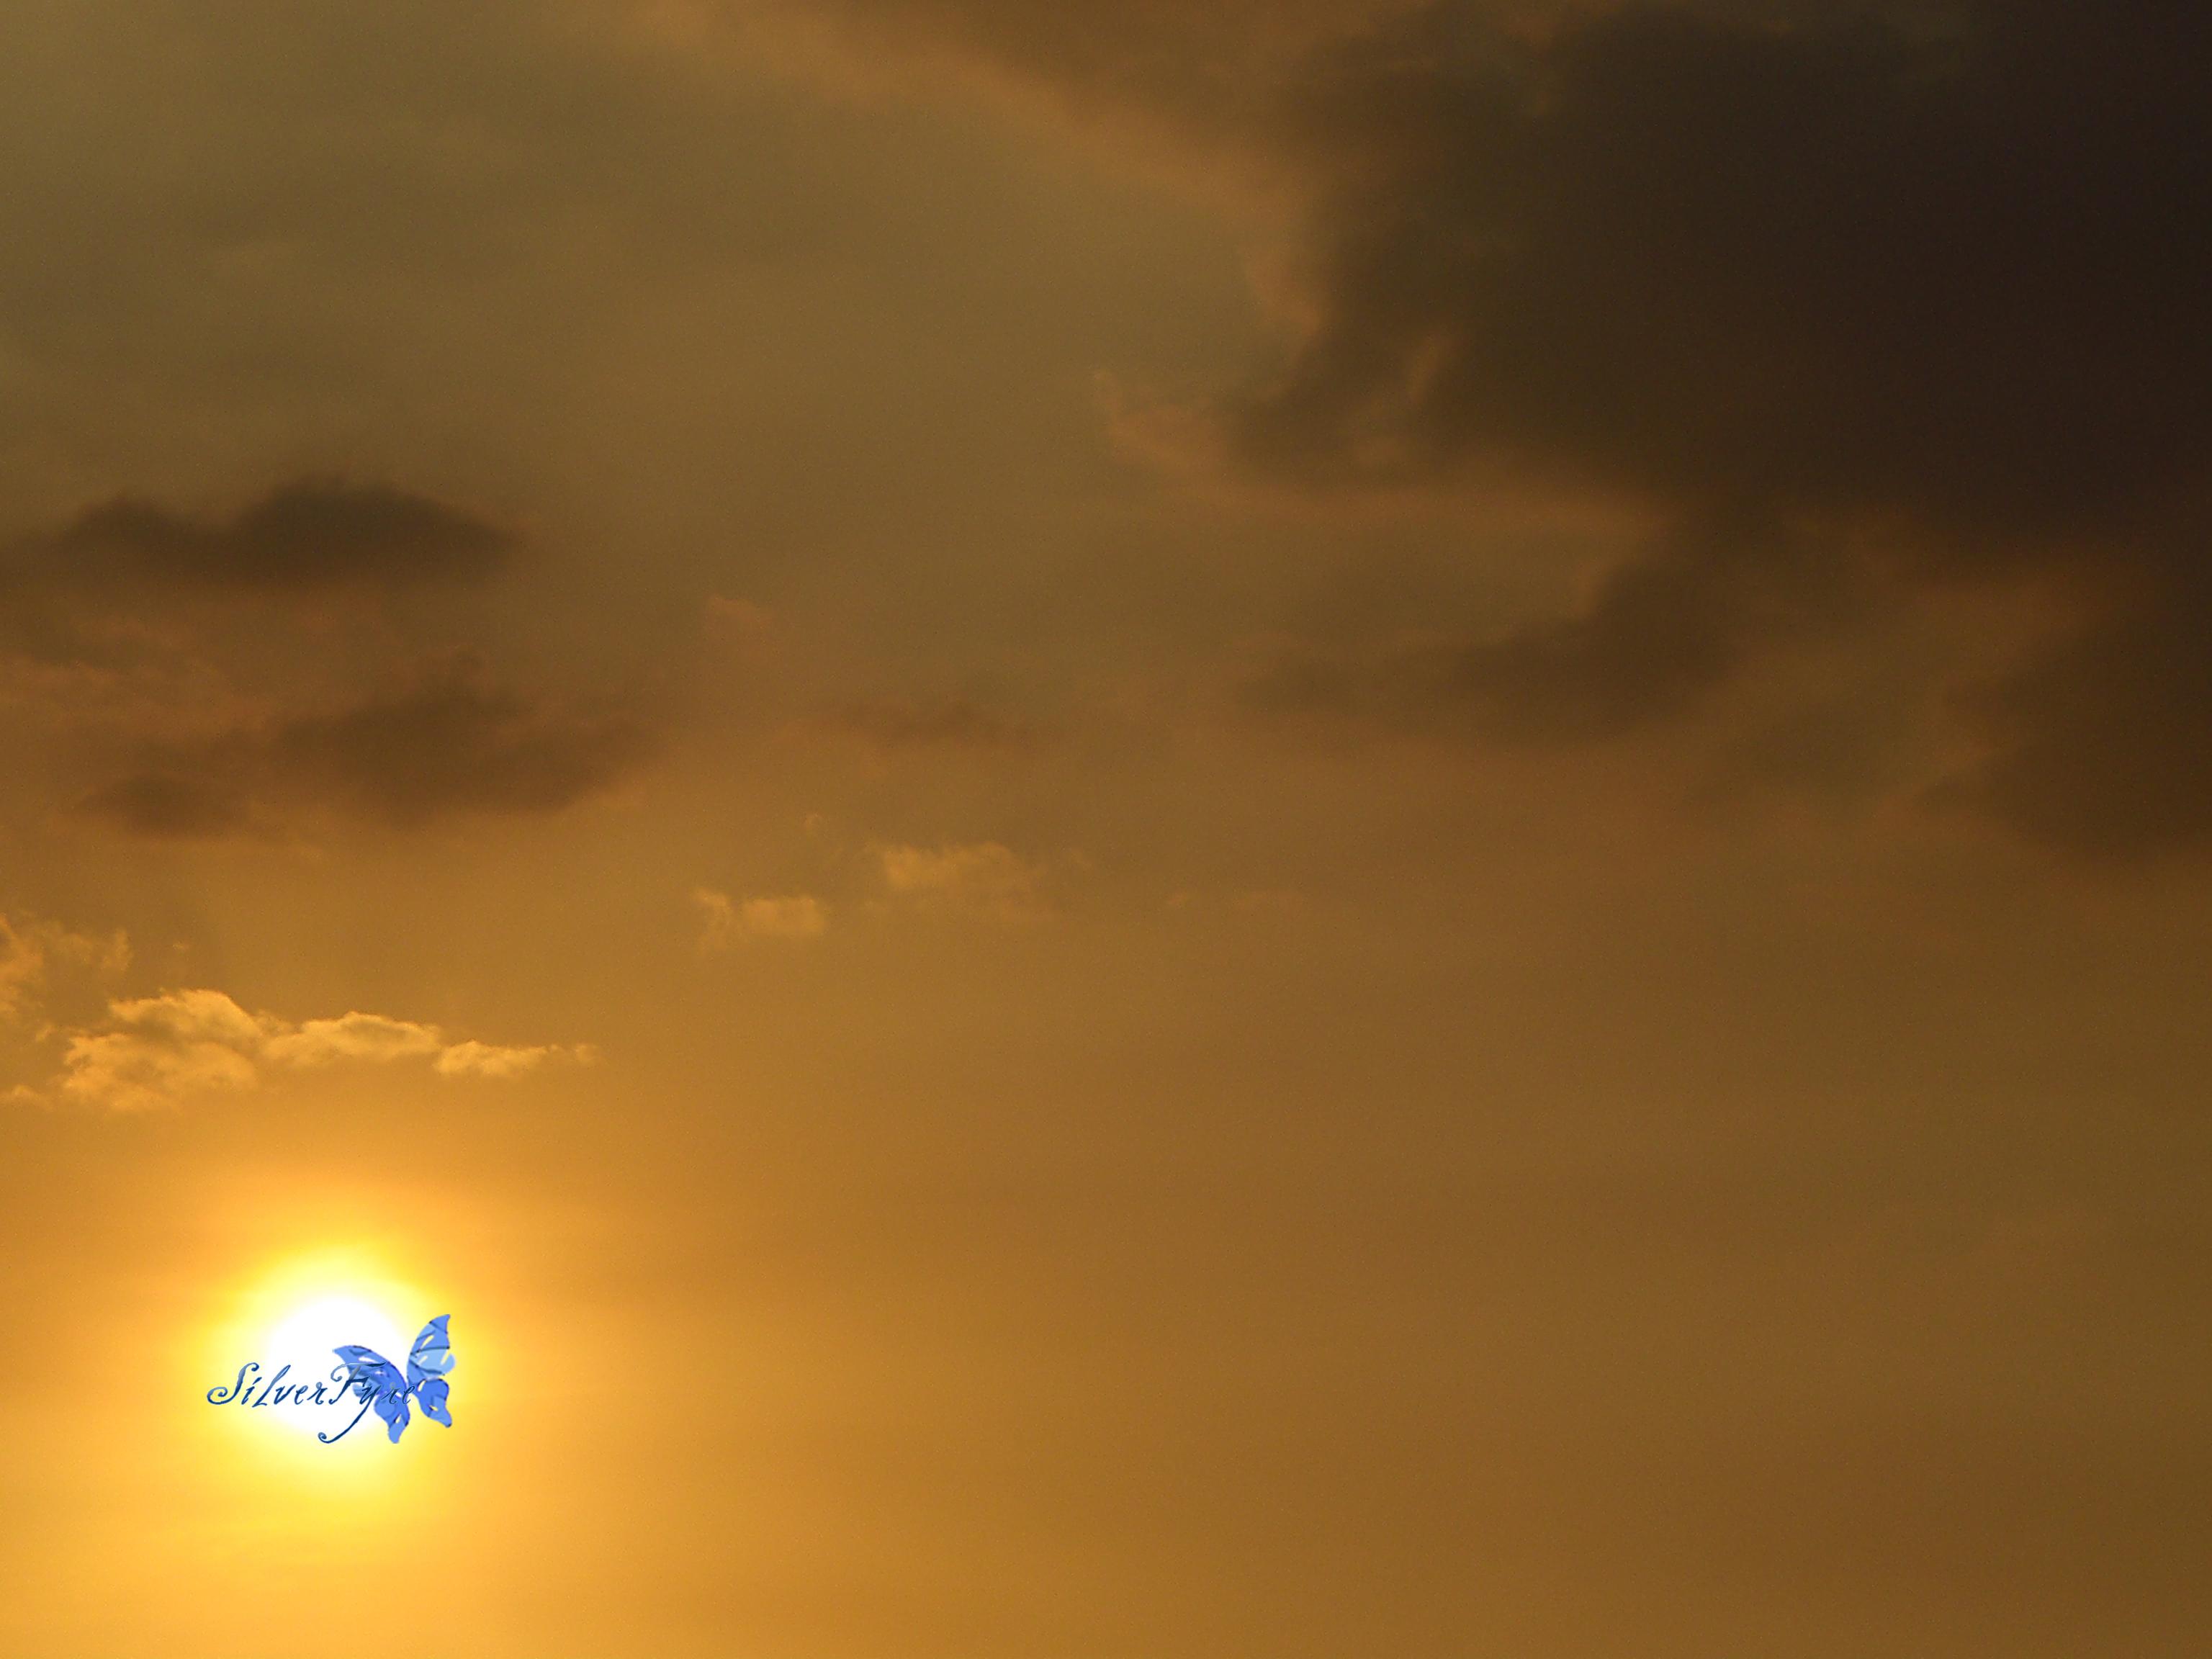 Sky: Summer Sun III by bloodyblue